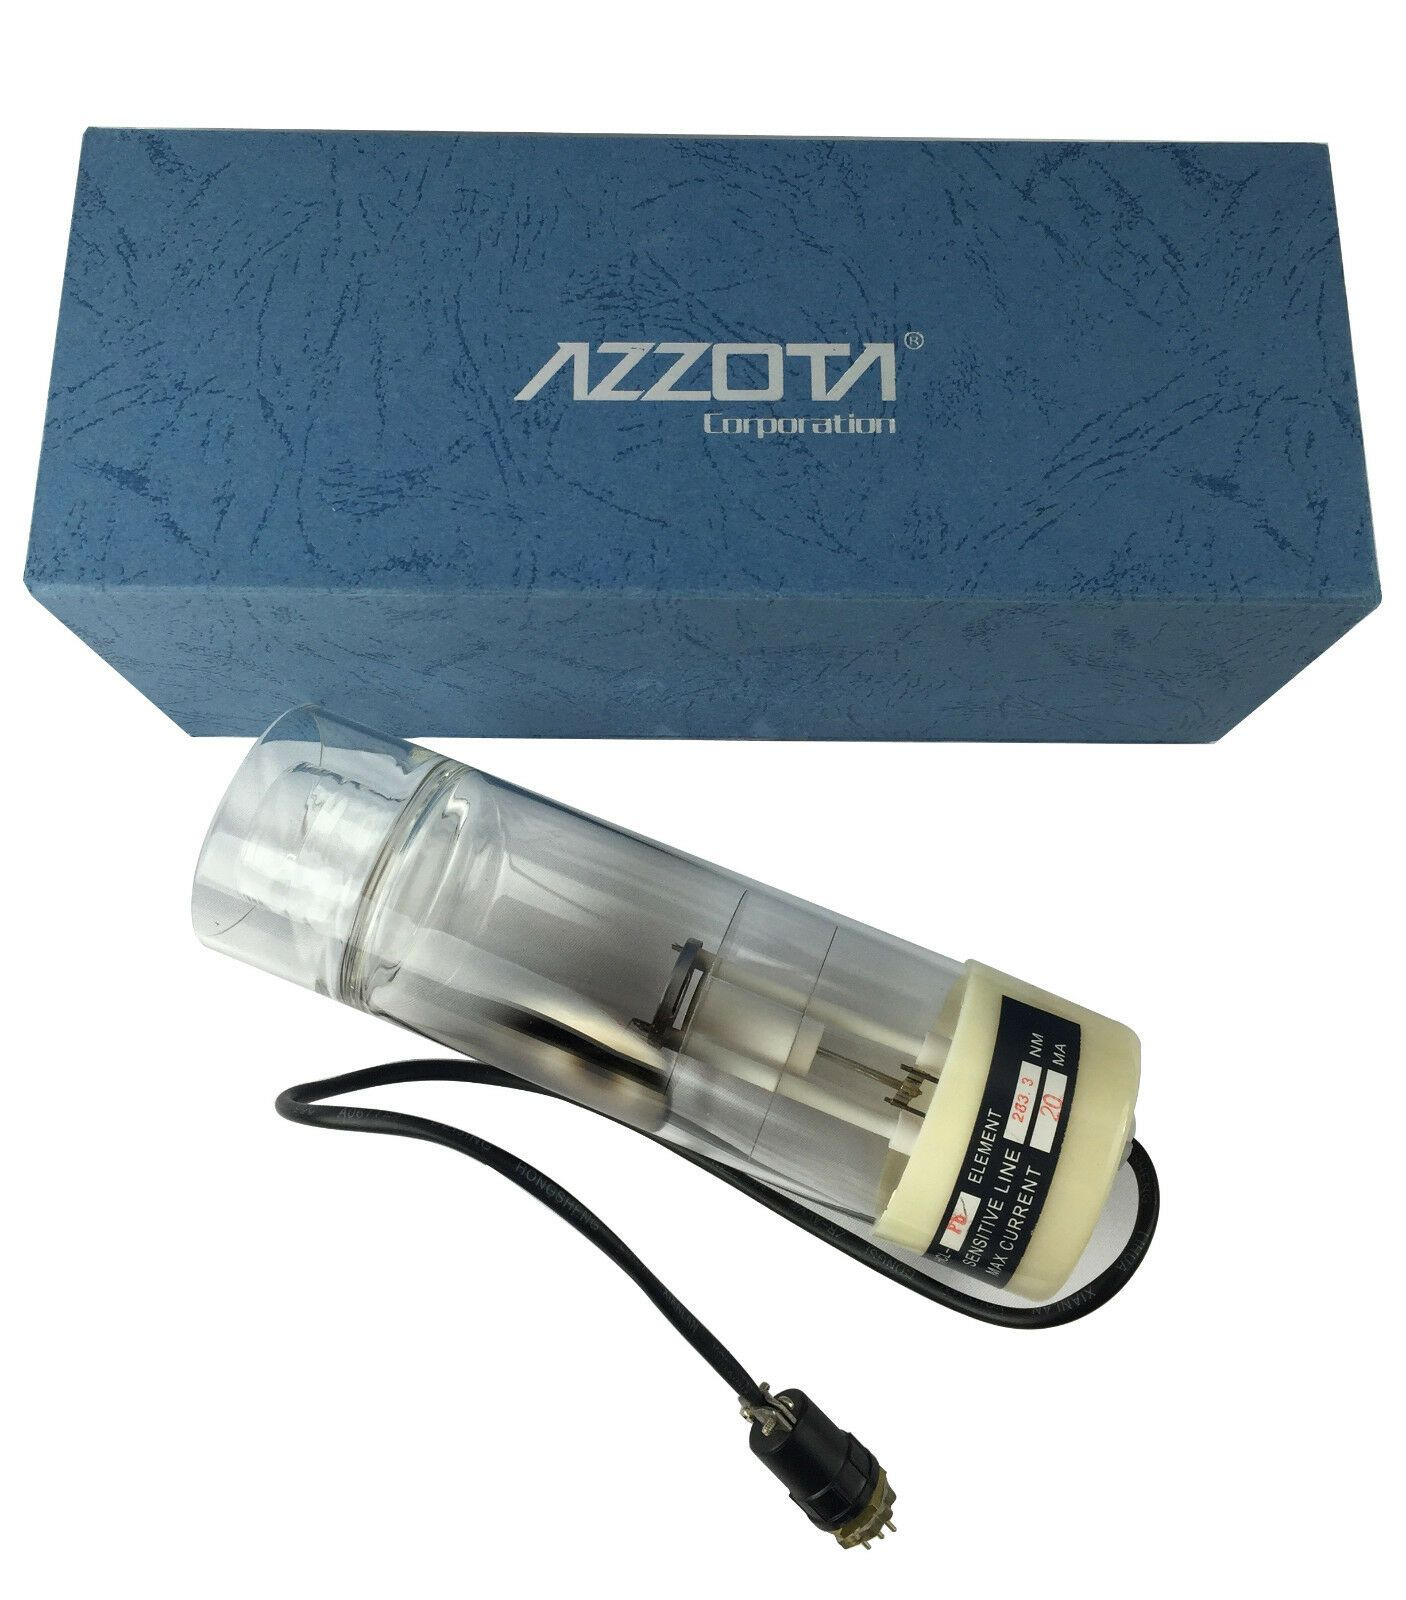 "Azzota 2"" Hollow Cathode Lamp, Mercury (Hg)"